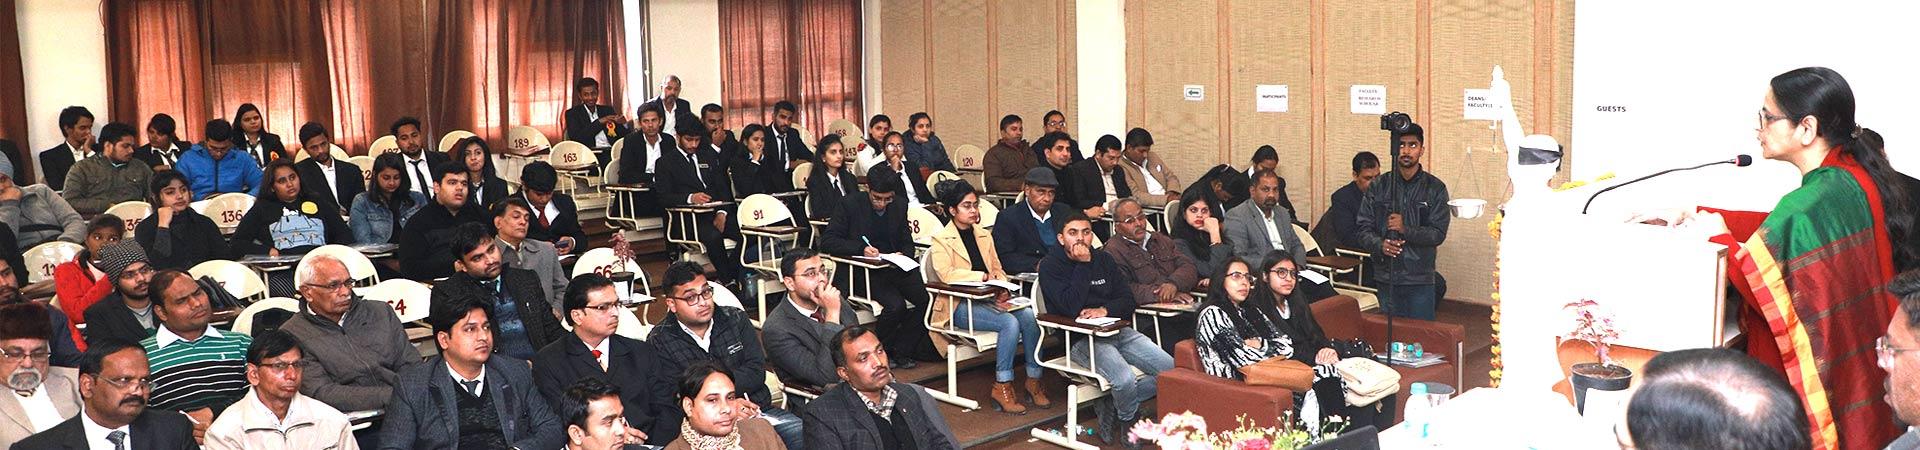 Shobhit University Law & Constitutional Studies